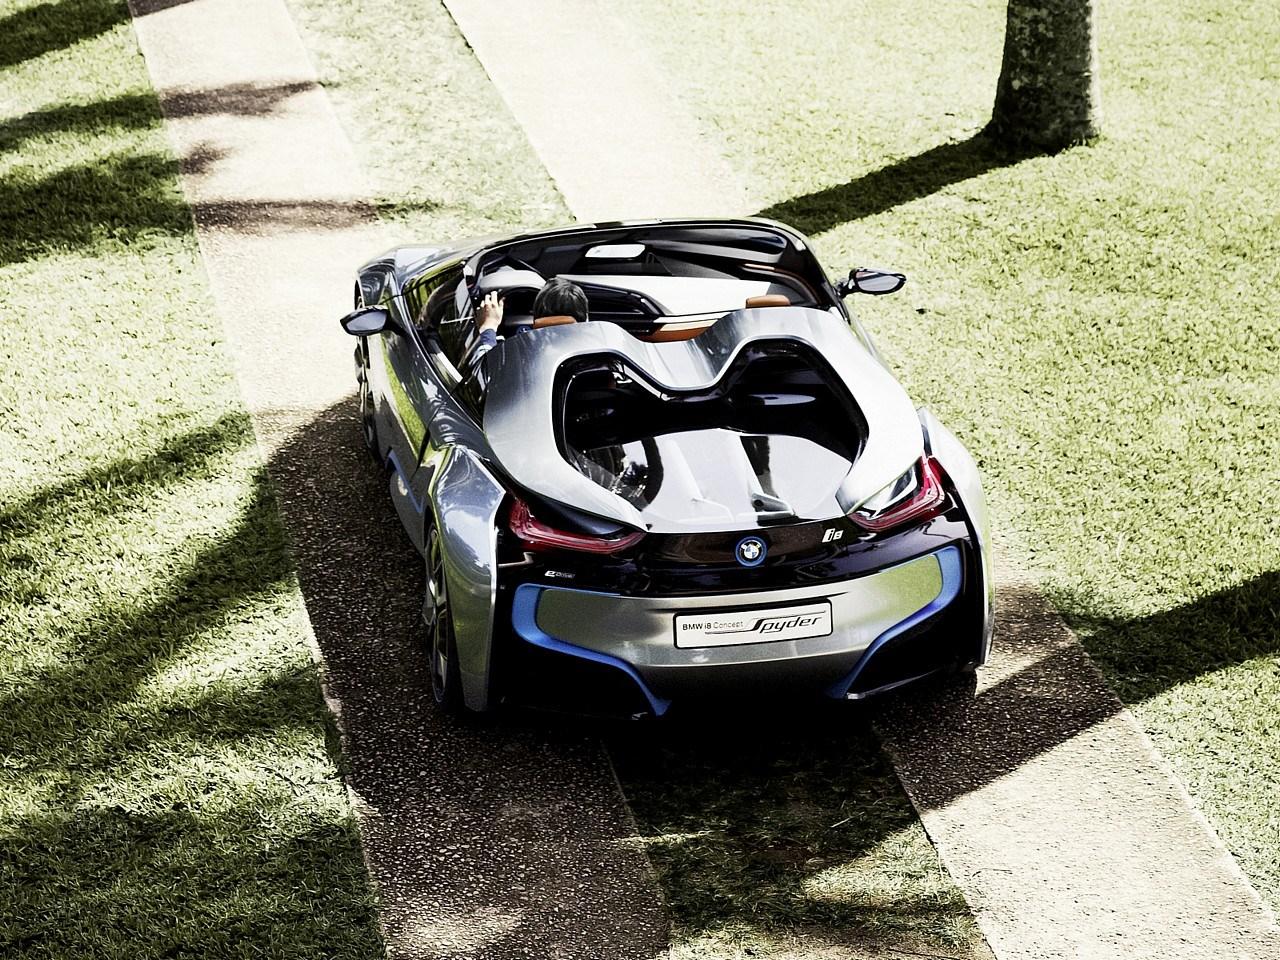 2018 bmw concept car.  2018 BMW Chief Confirms I8 Spyder For 2018 Arrival With Bmw Concept Car